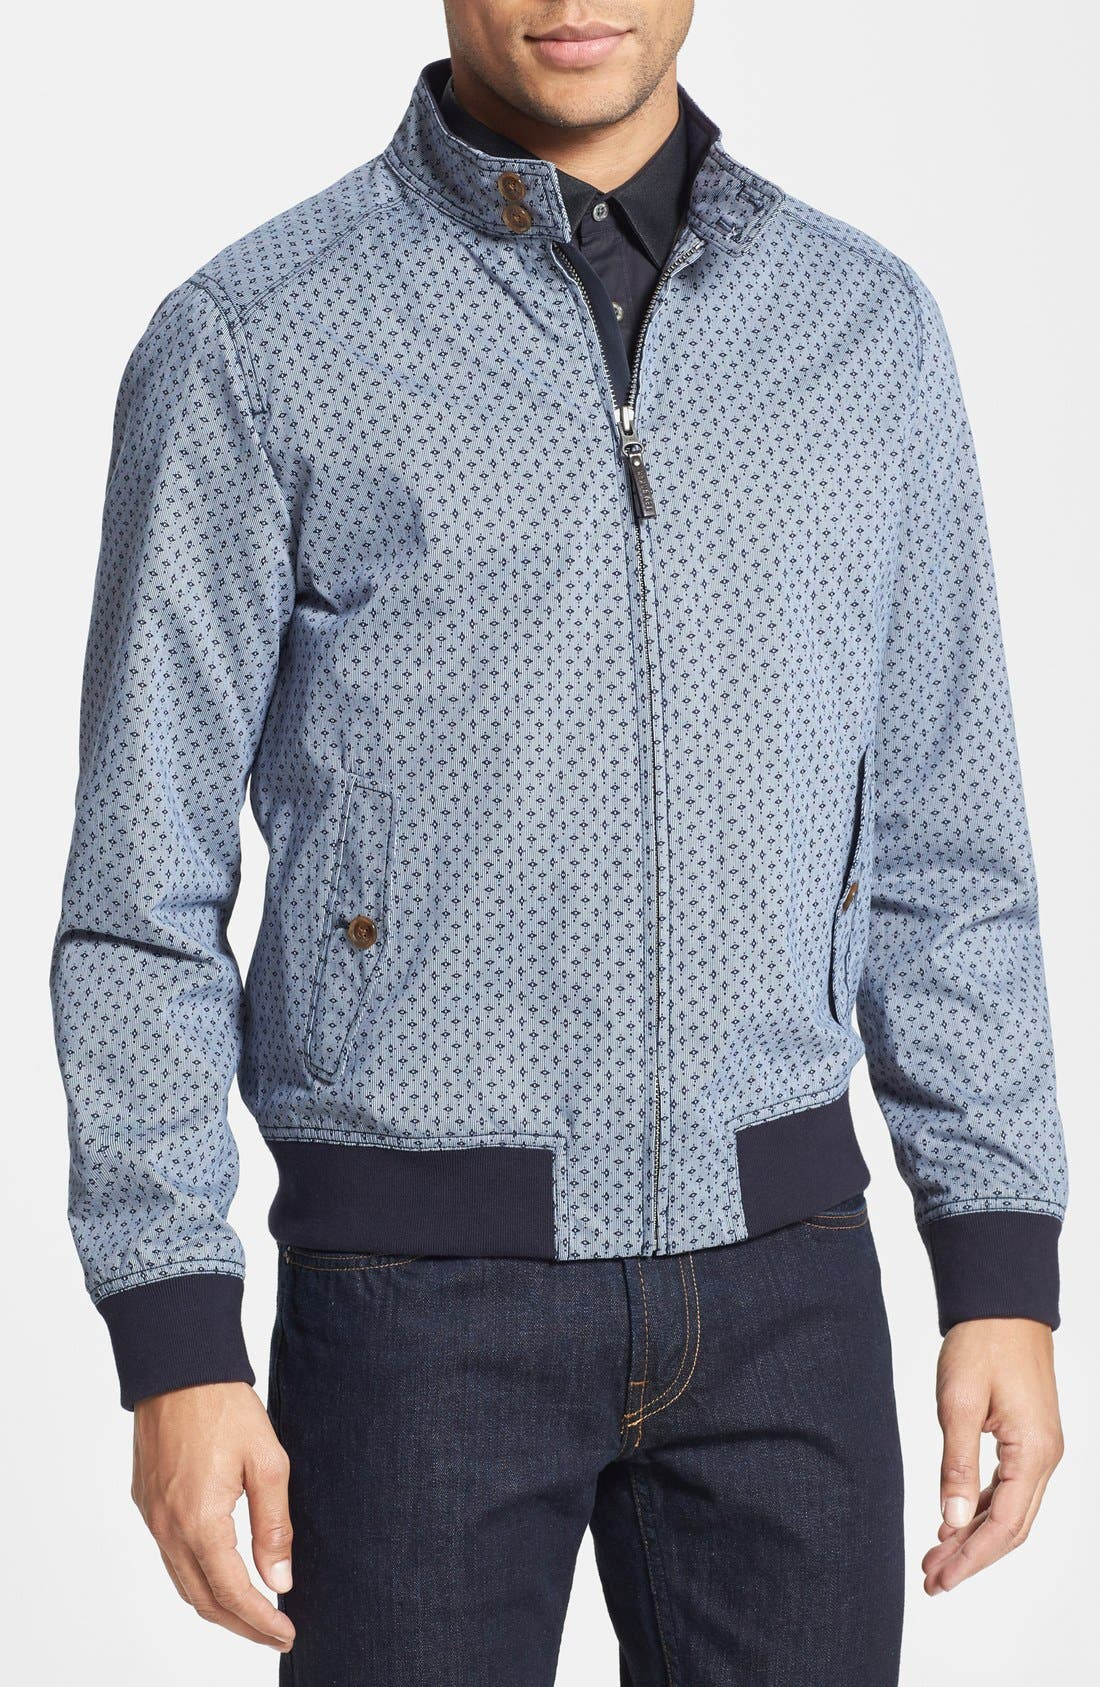 Alternate Image 1 Selected - Ted Baker London 'Lorien' Printed Cotton Bomber Jacket